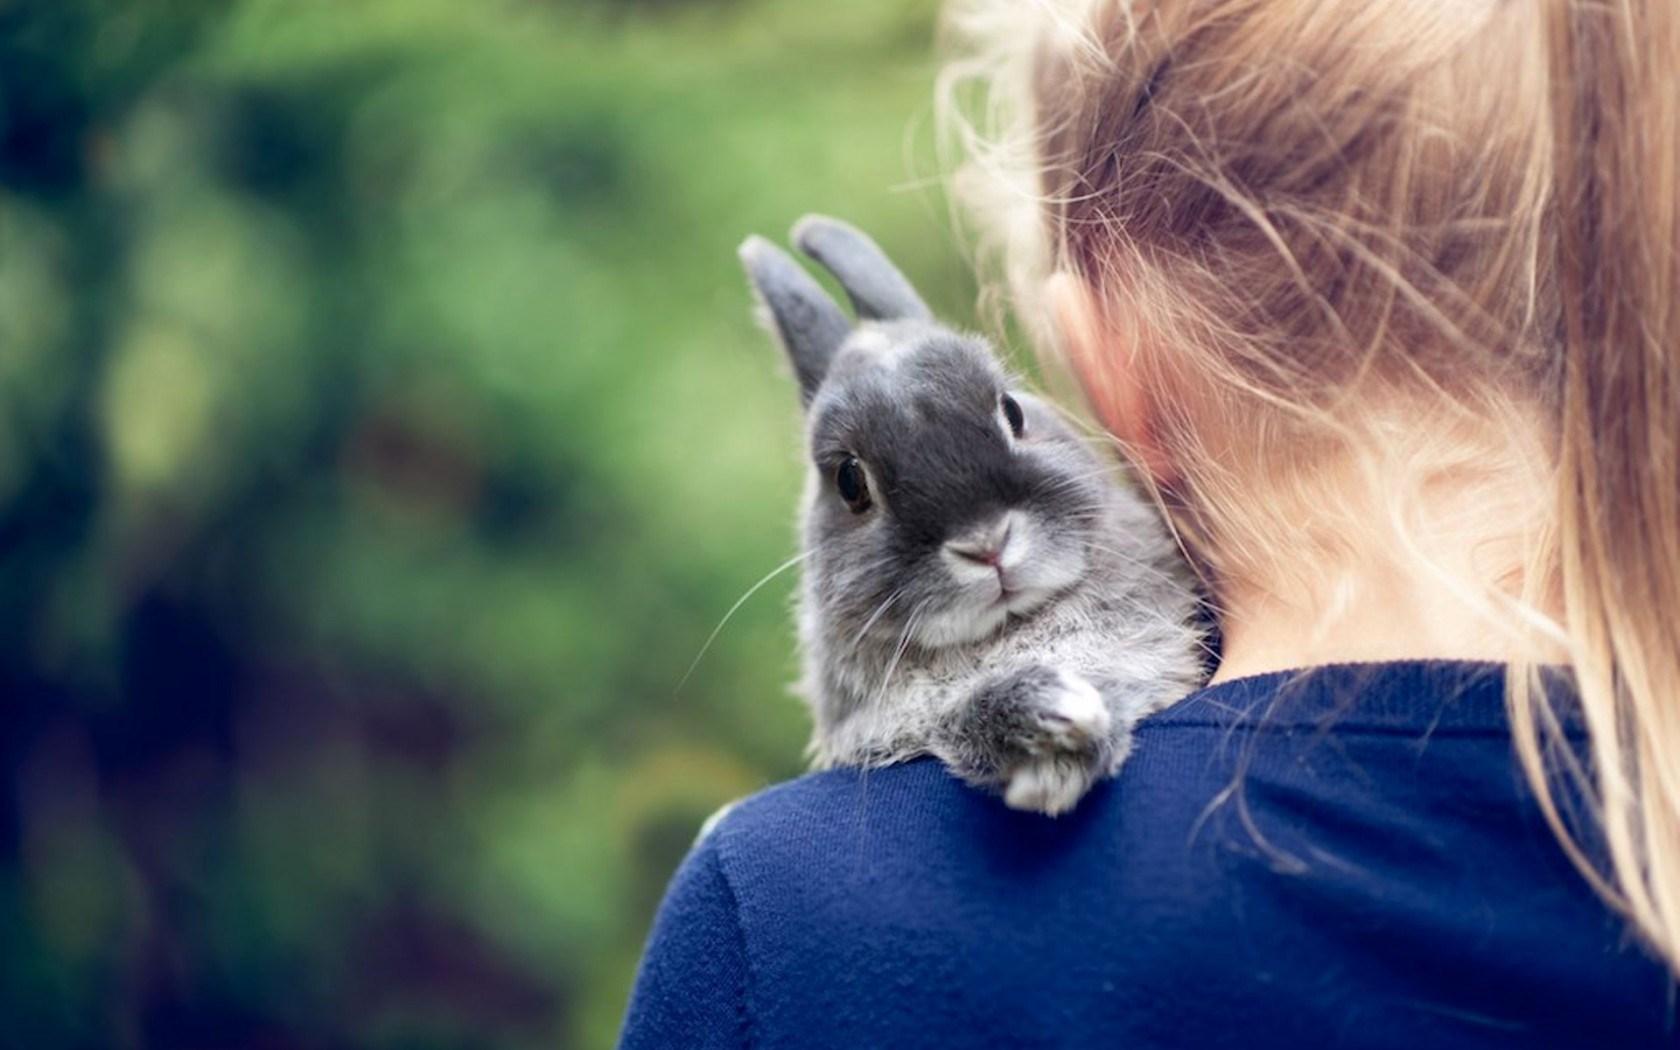 Cute Rabbit Wallpapers For Desktop Rabbits Hd Wallpaper Hd Desktop Wallpapers 4k Hd